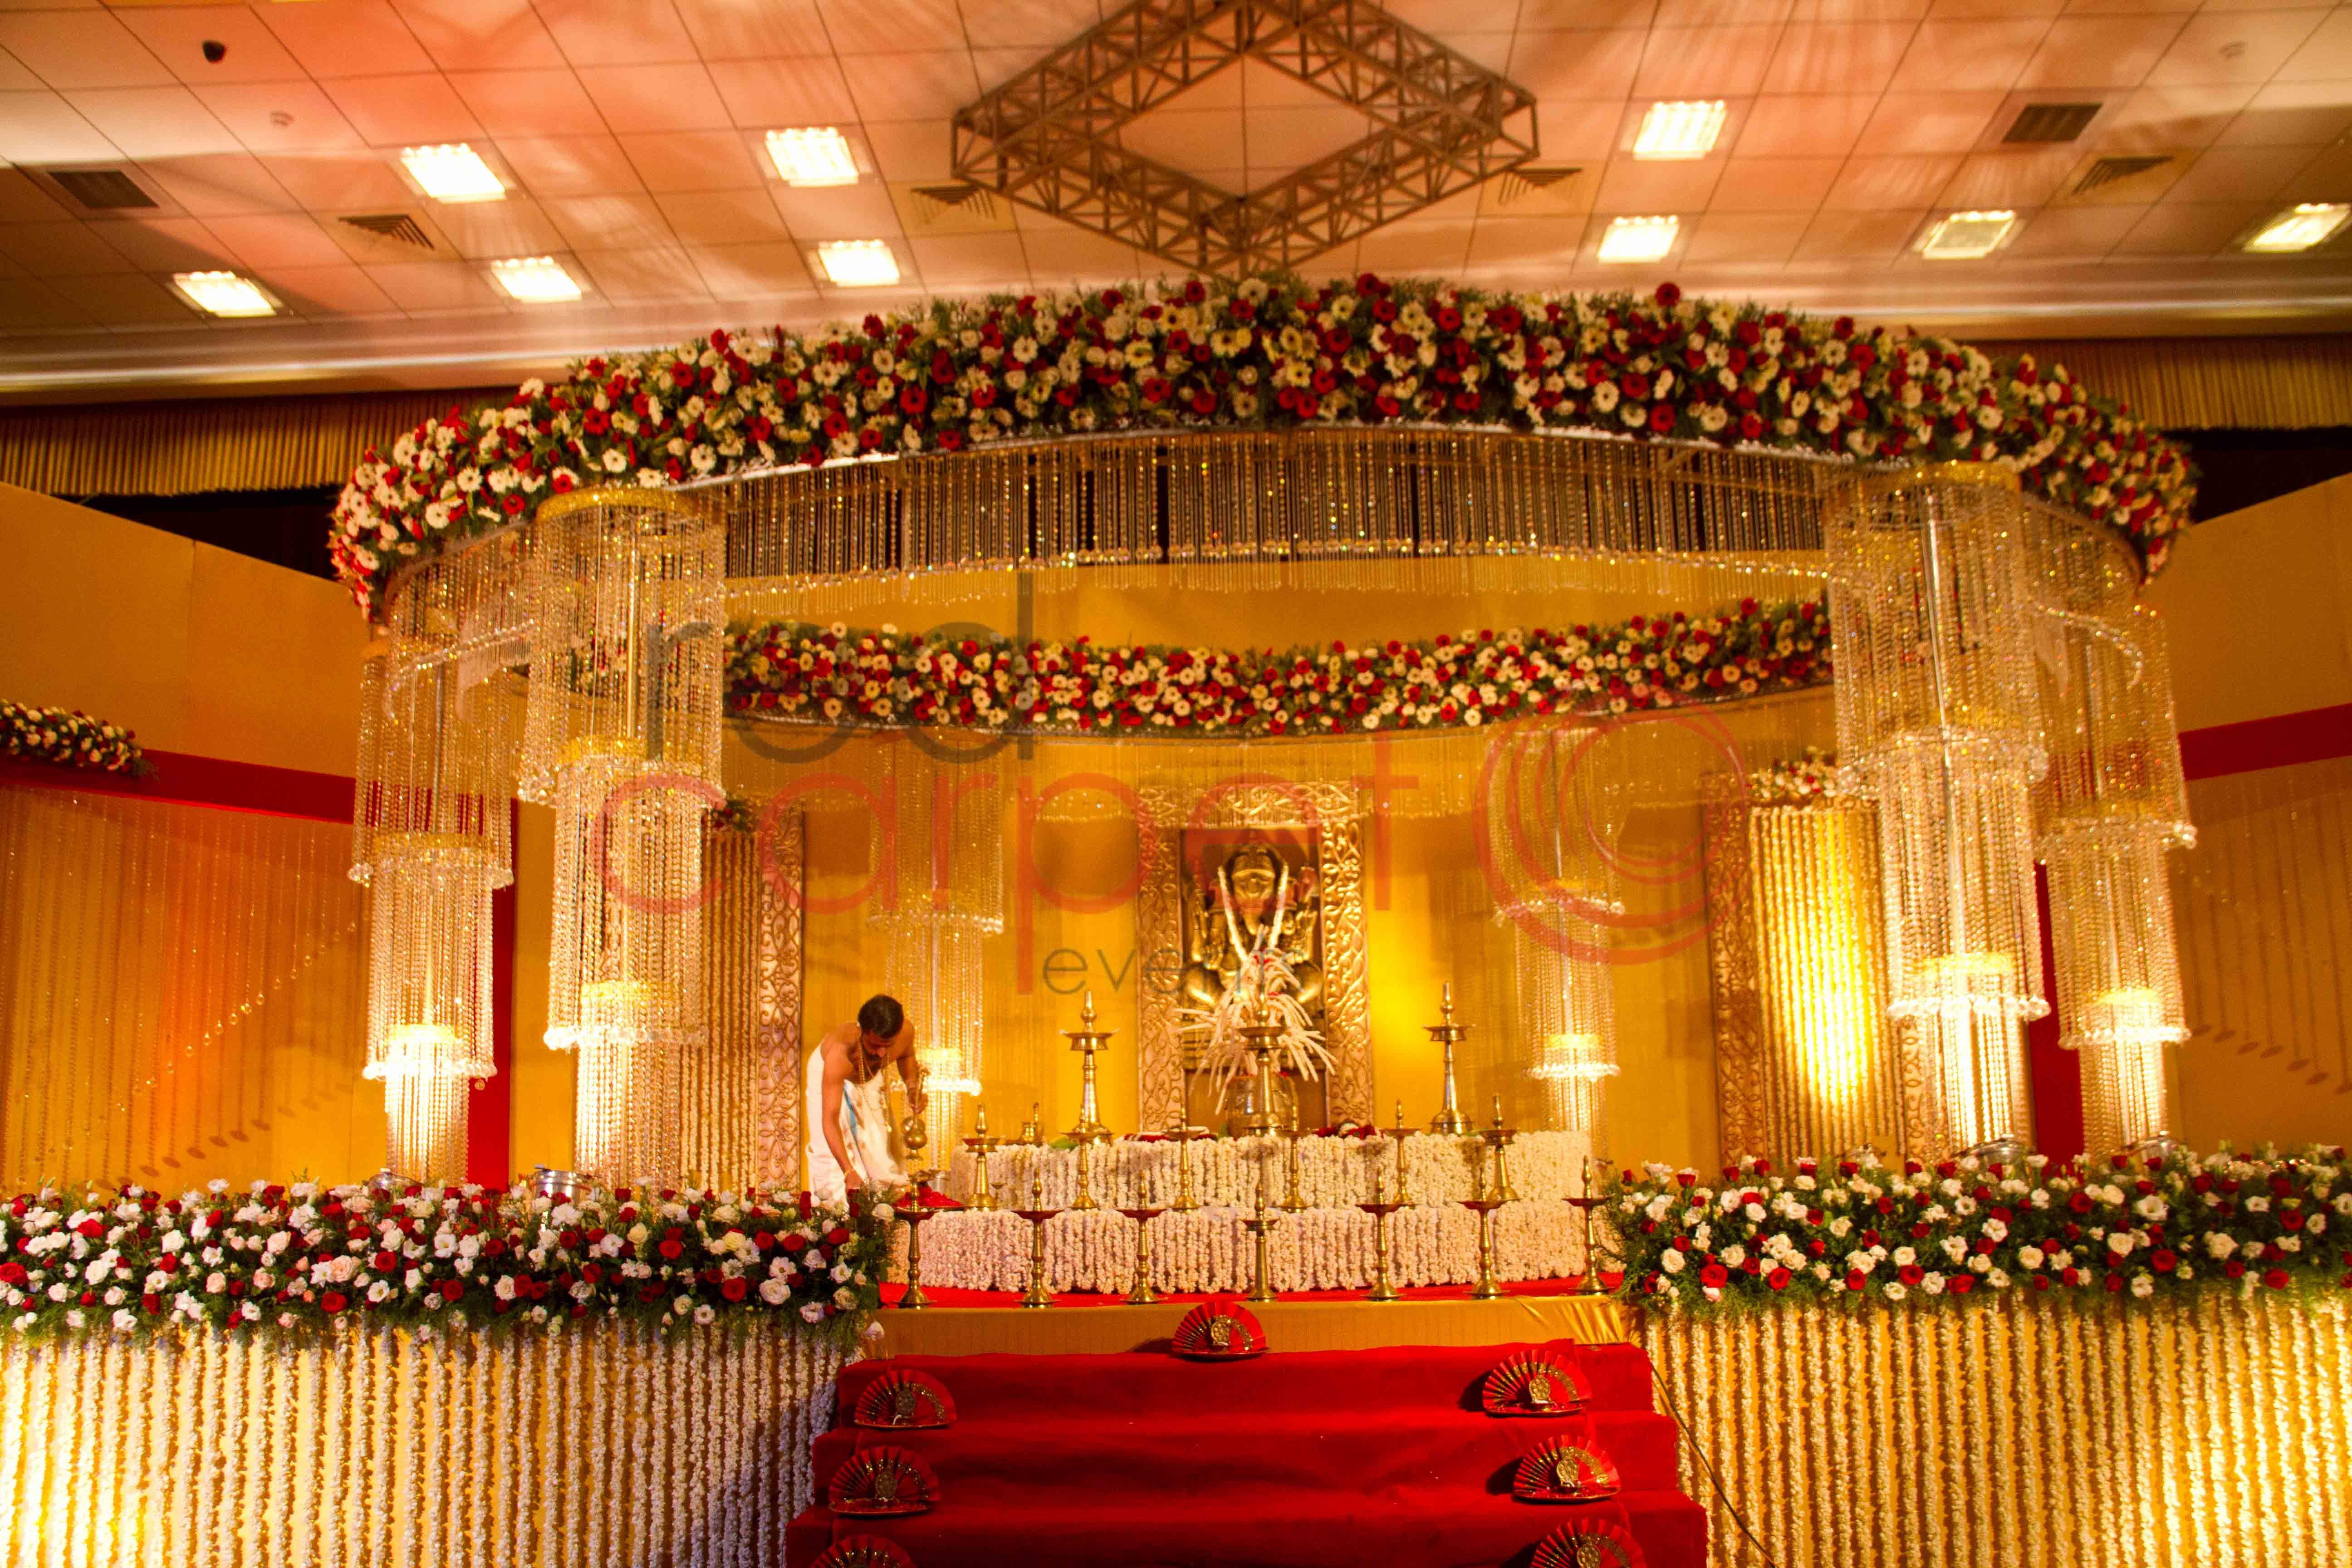 Hindu crystal wedding stage | Wedding stage decorations ...